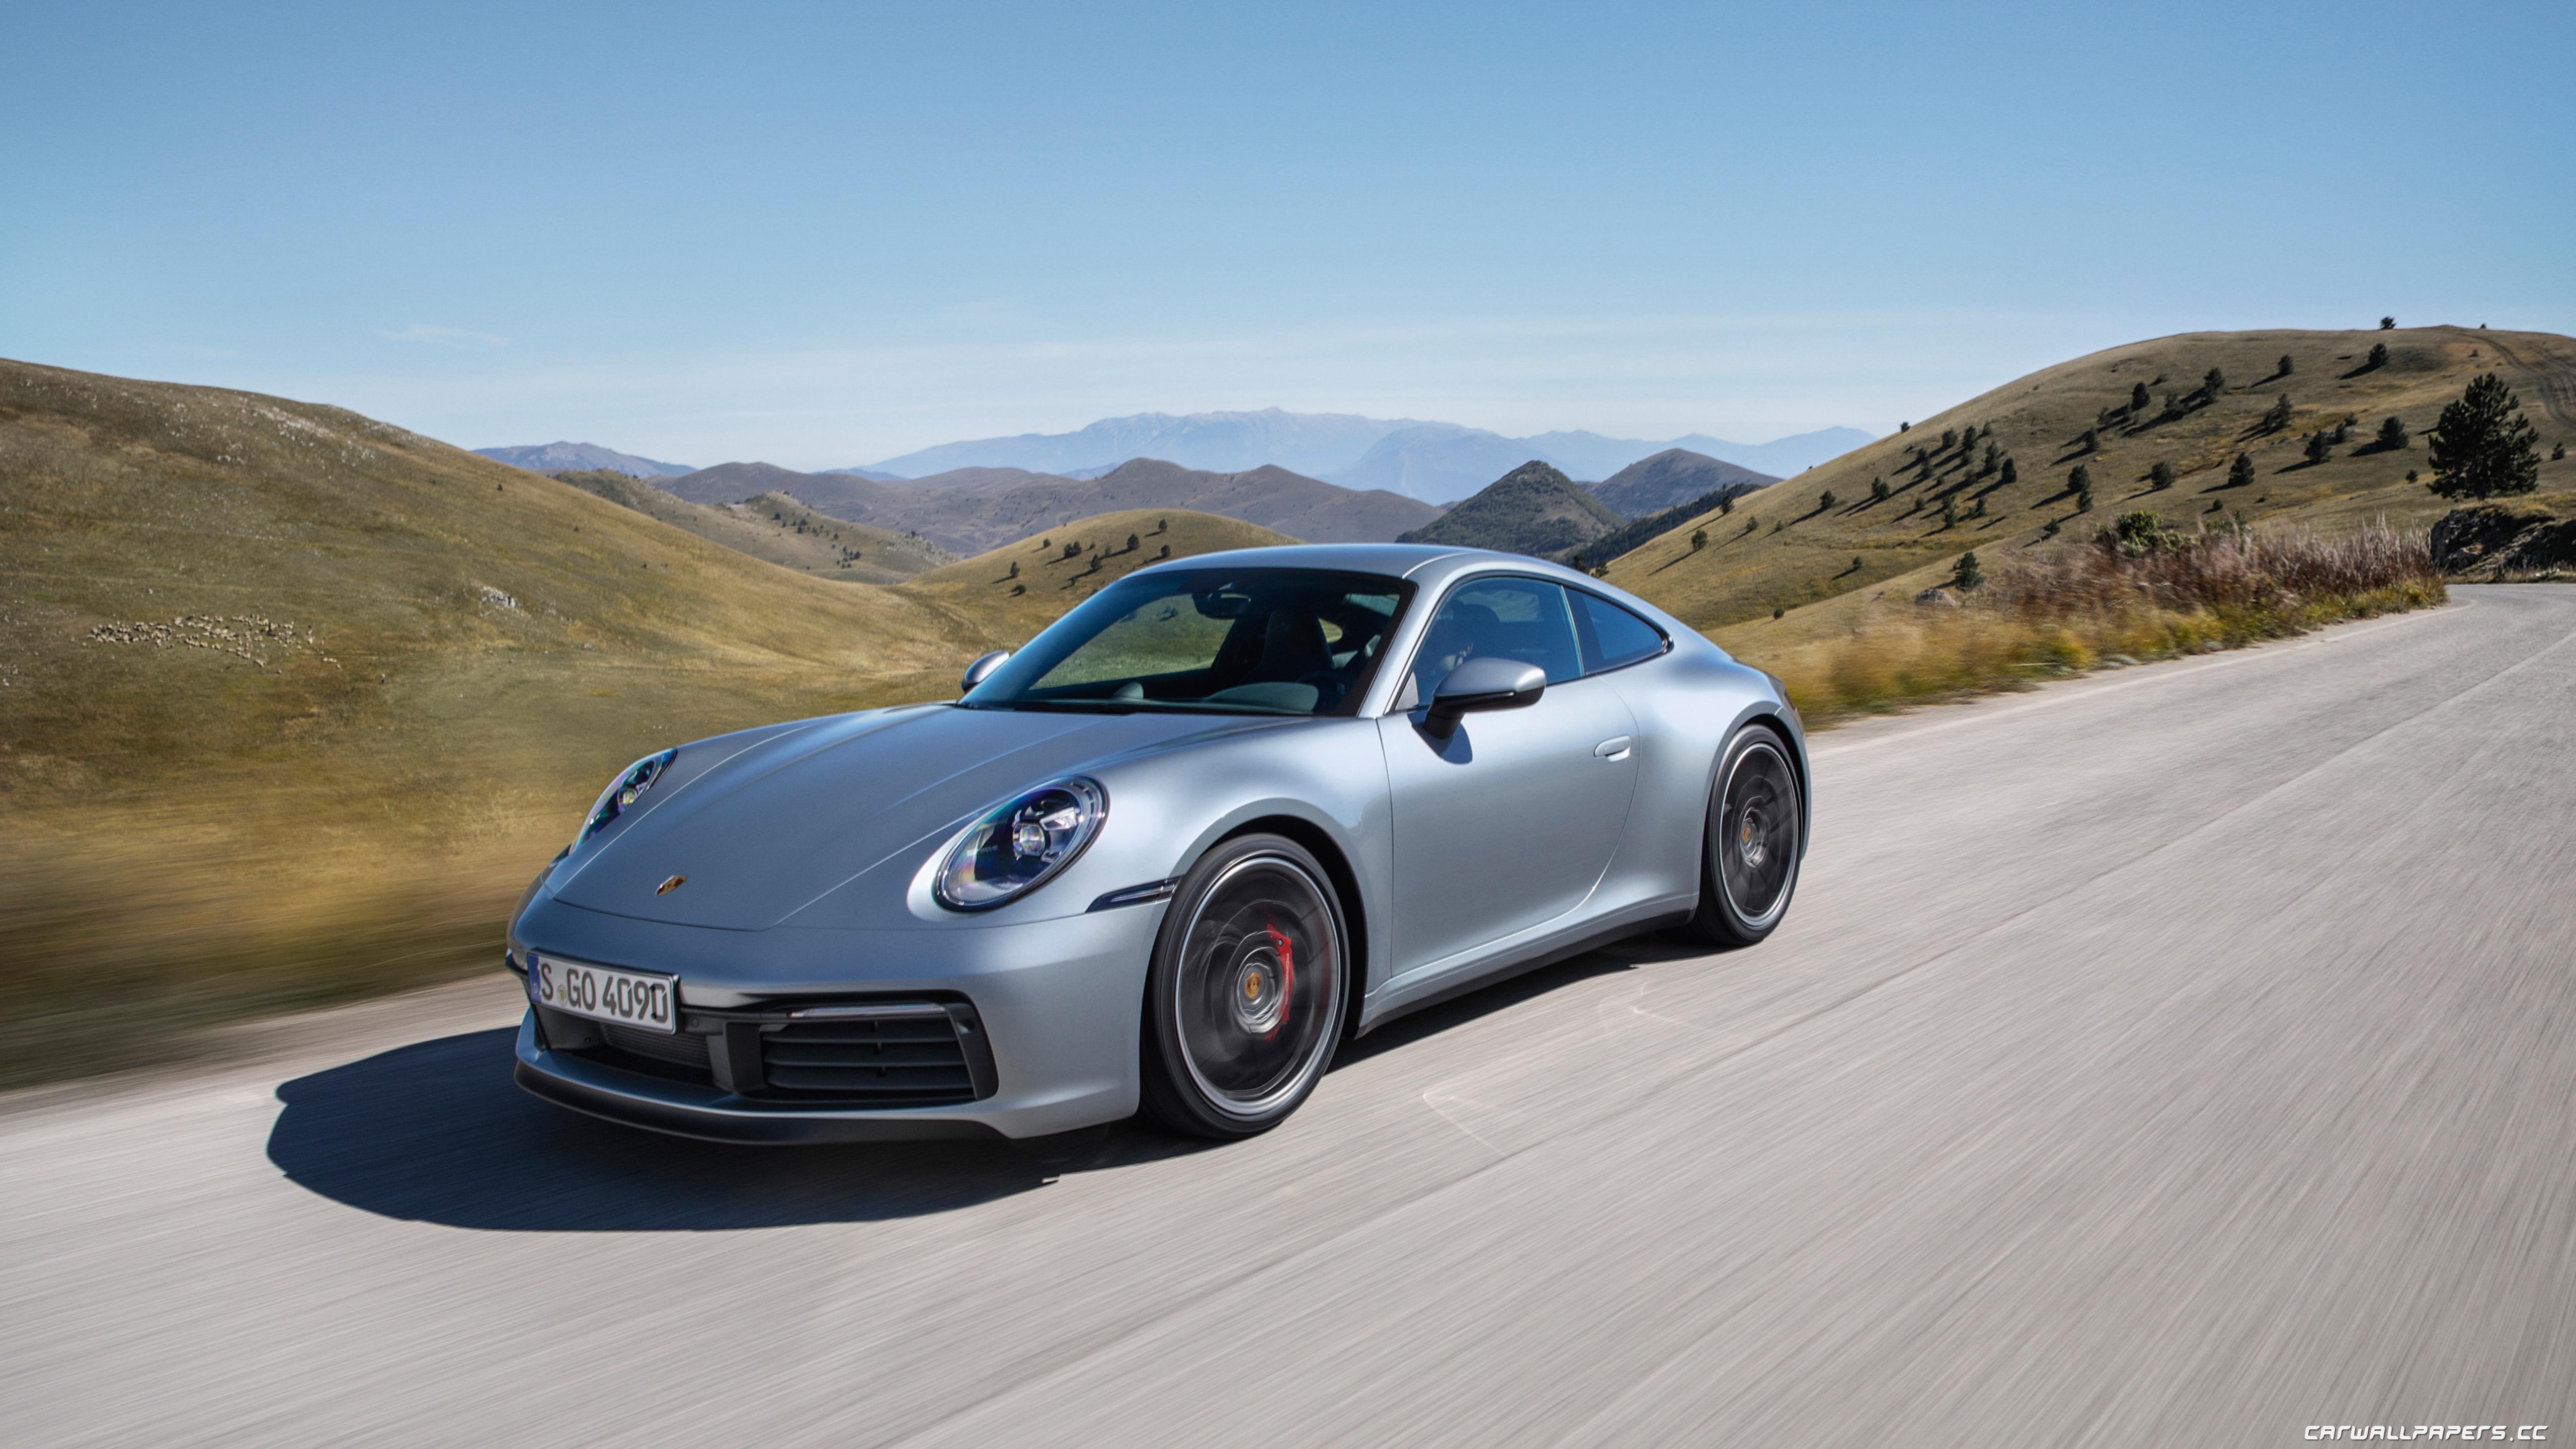 Cars Desktop Wallpapers Porsche 911 Carrera 4s 2019 Porsche 911 carrera 4s 2019 5k